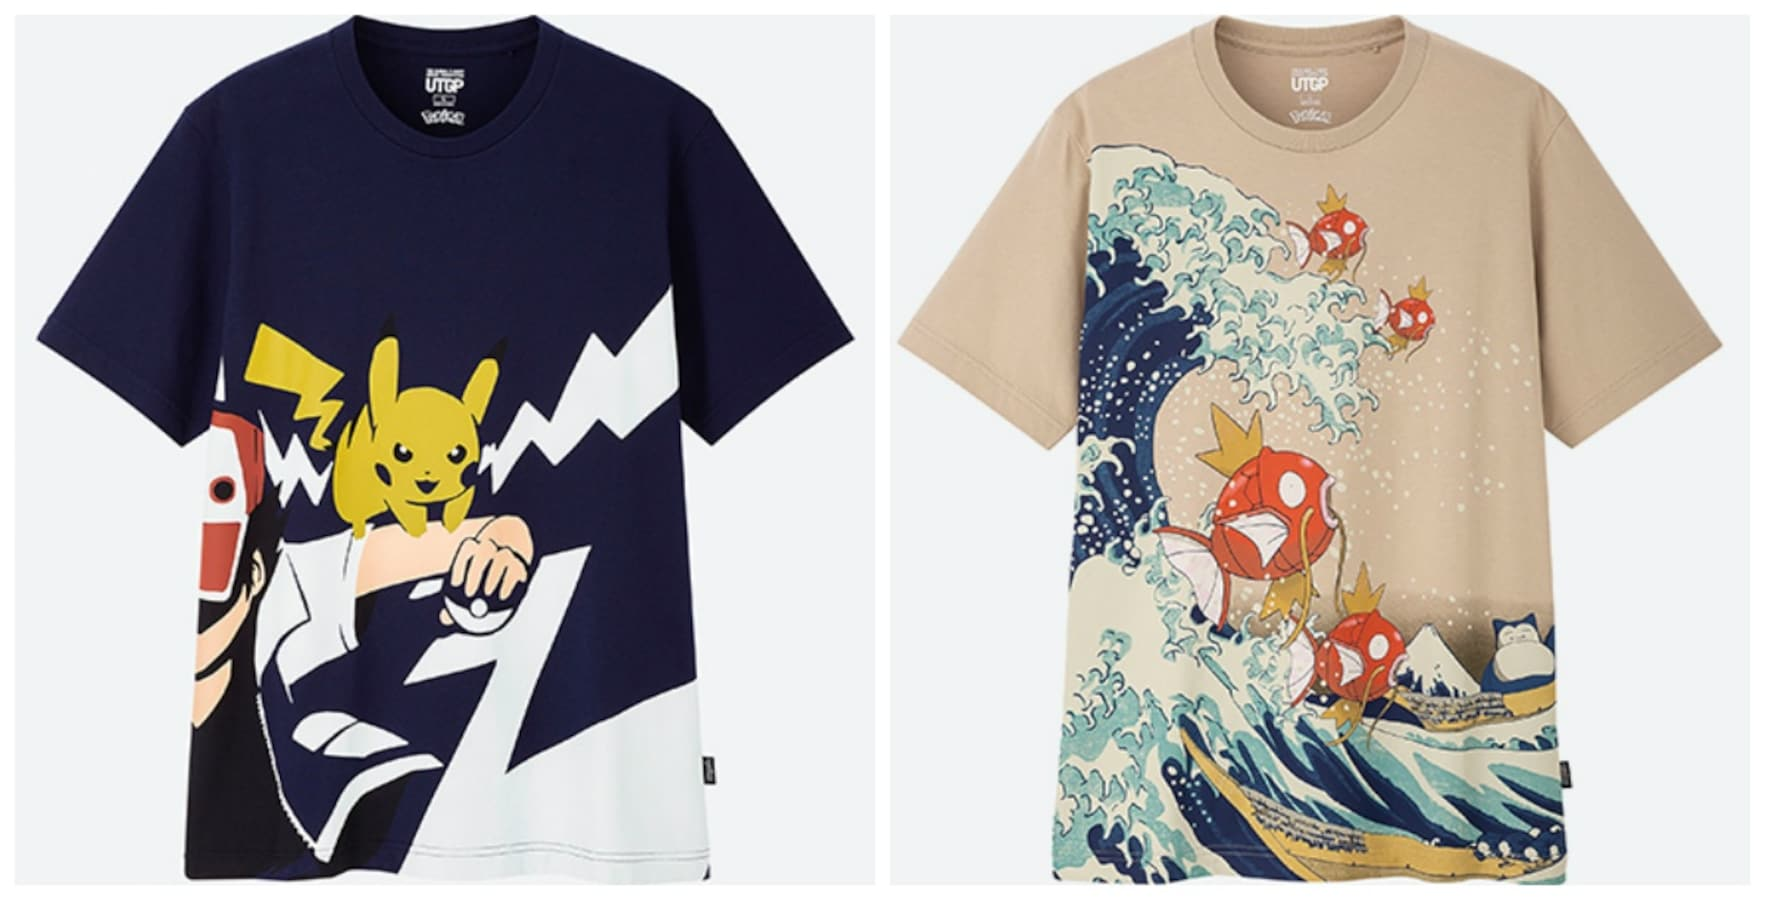 5dce8aba Uniqlo Pokémon T-Shirt Design Winners | All About Japan